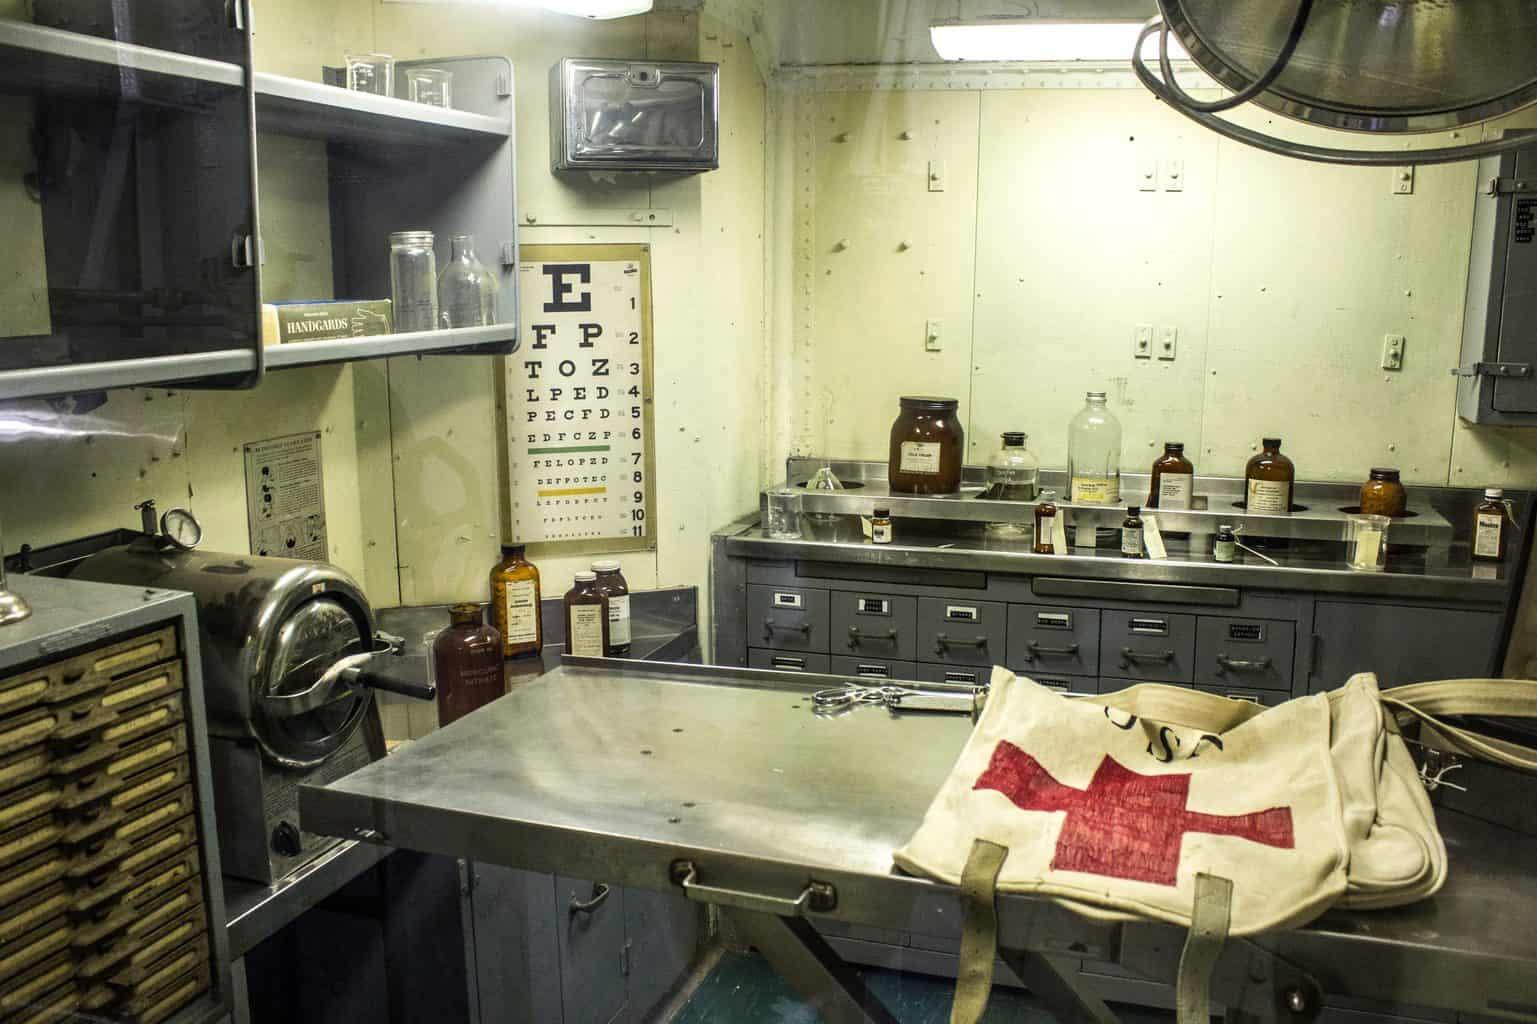 aircraft carrier infirmary, hospital, navy